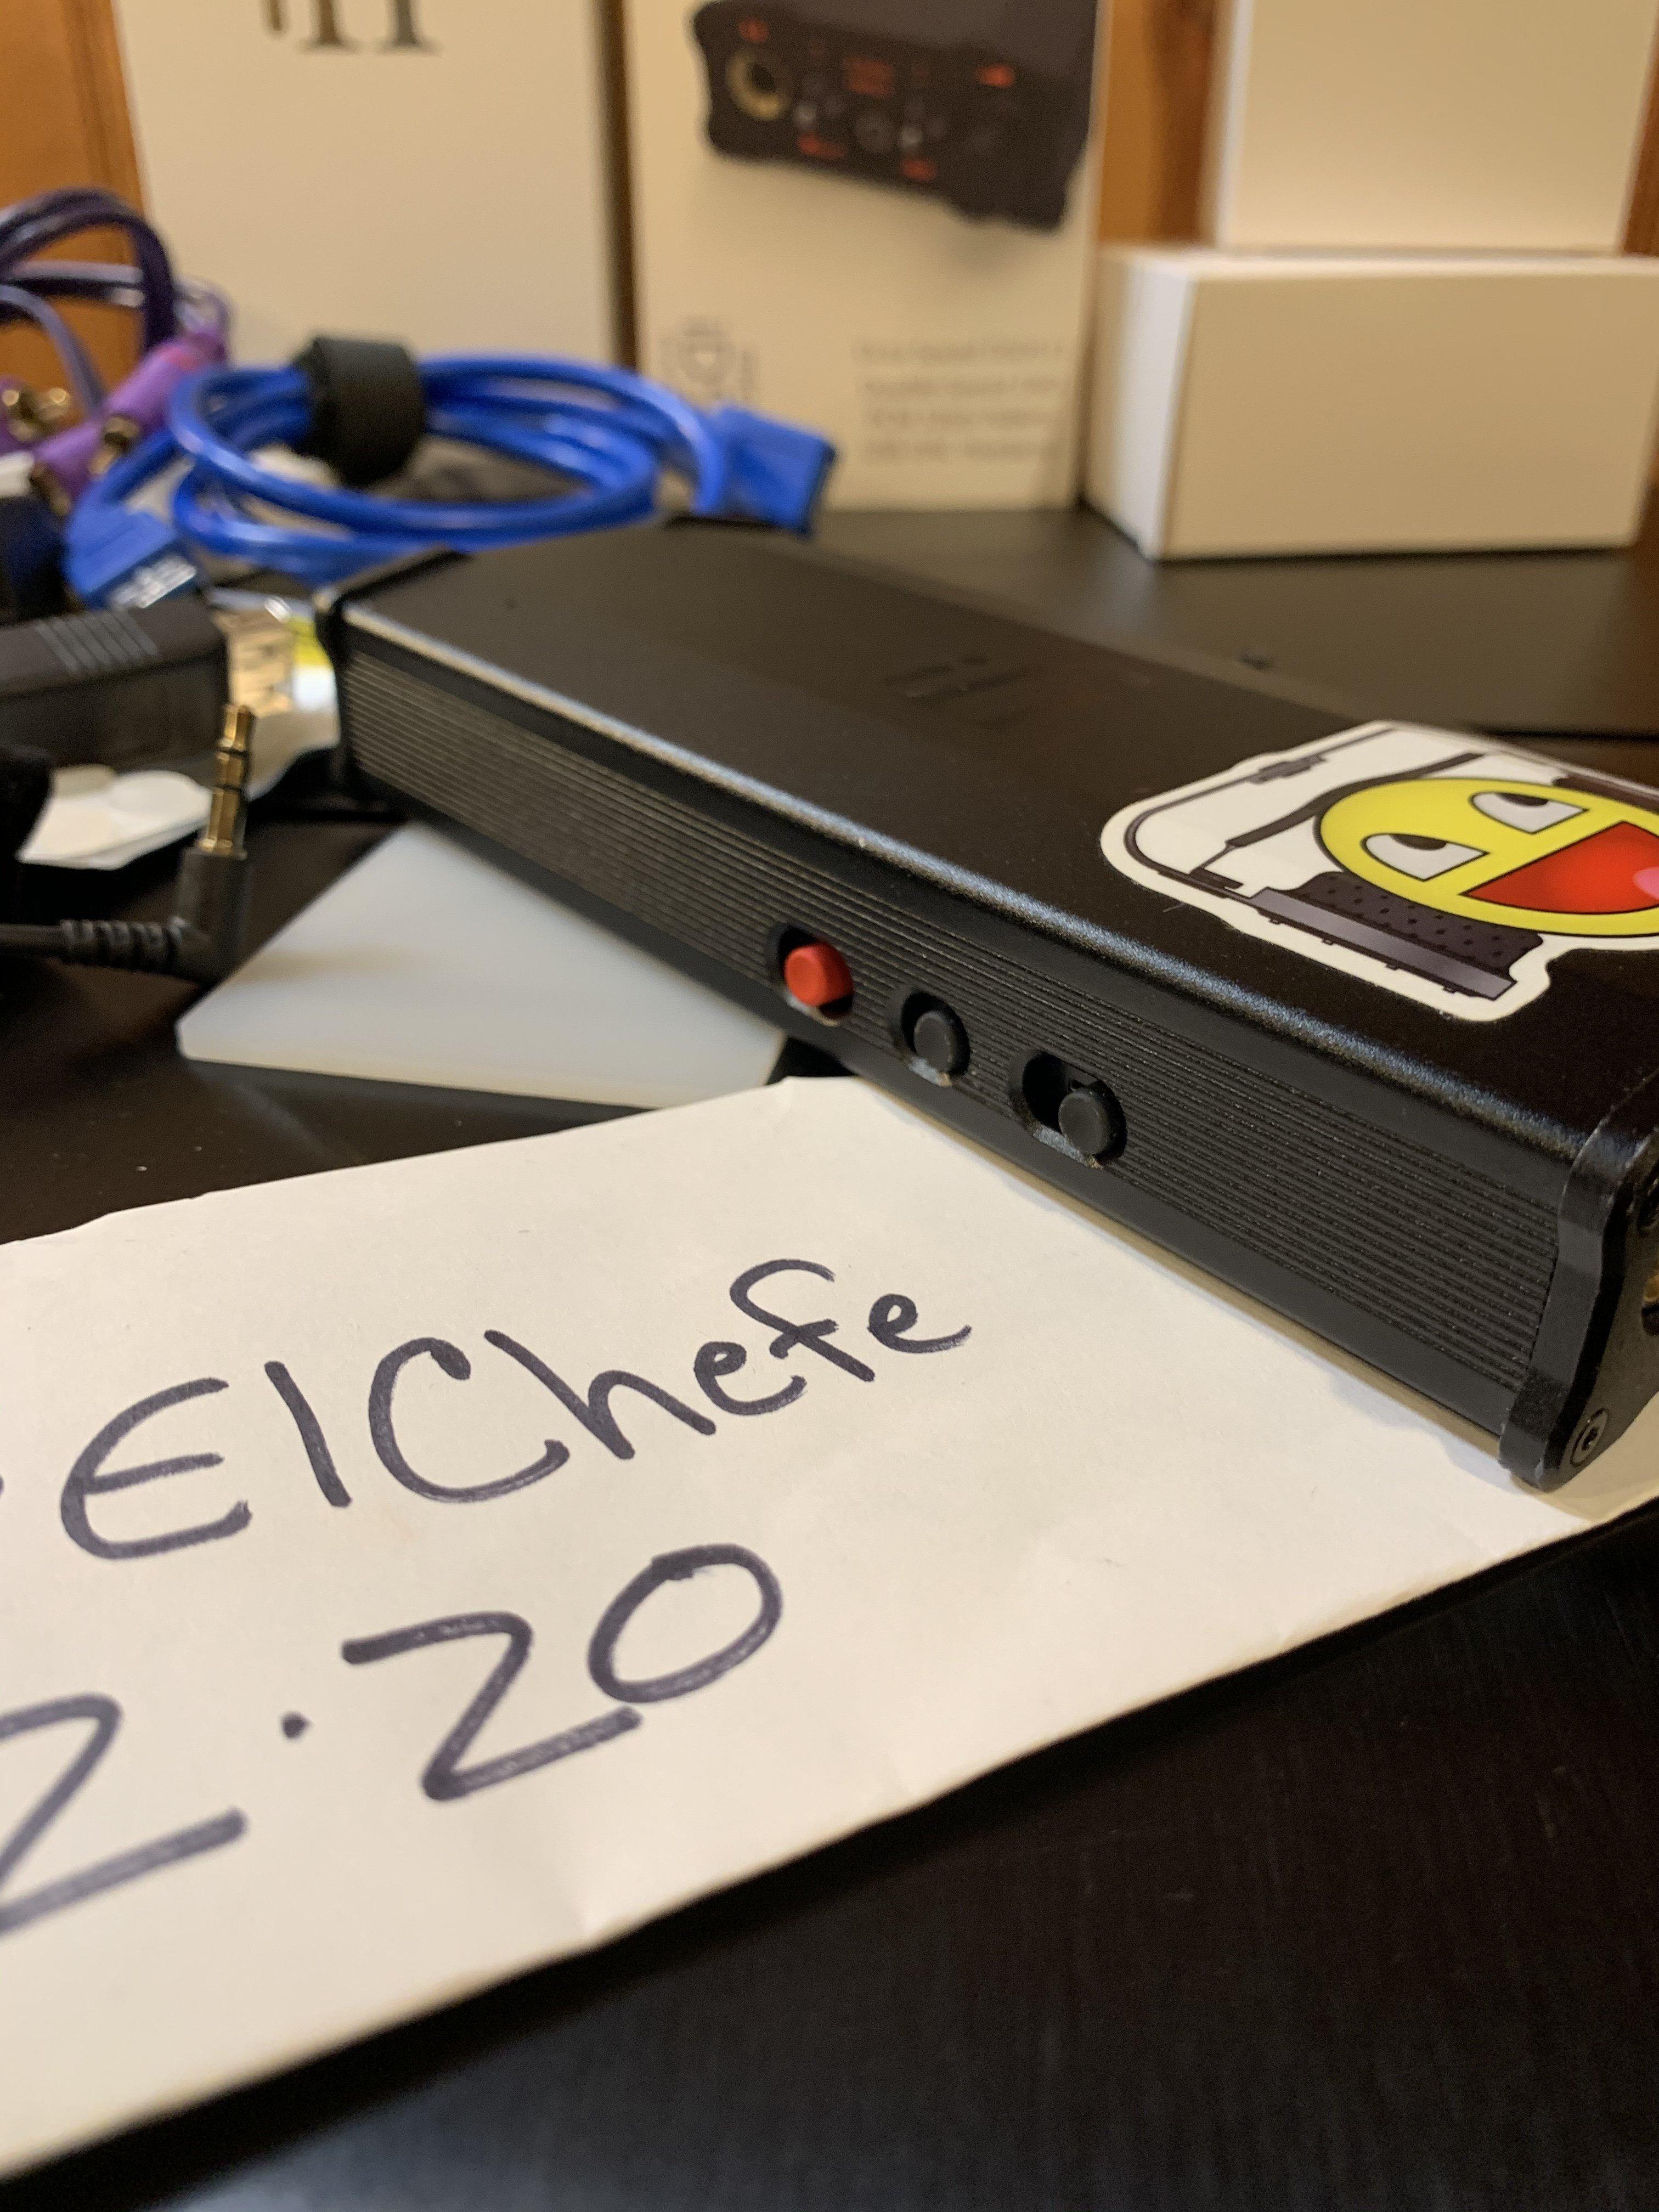 FC17D3C8-A5C3-46A7-B4C7-3FD4726339EB.jpeg